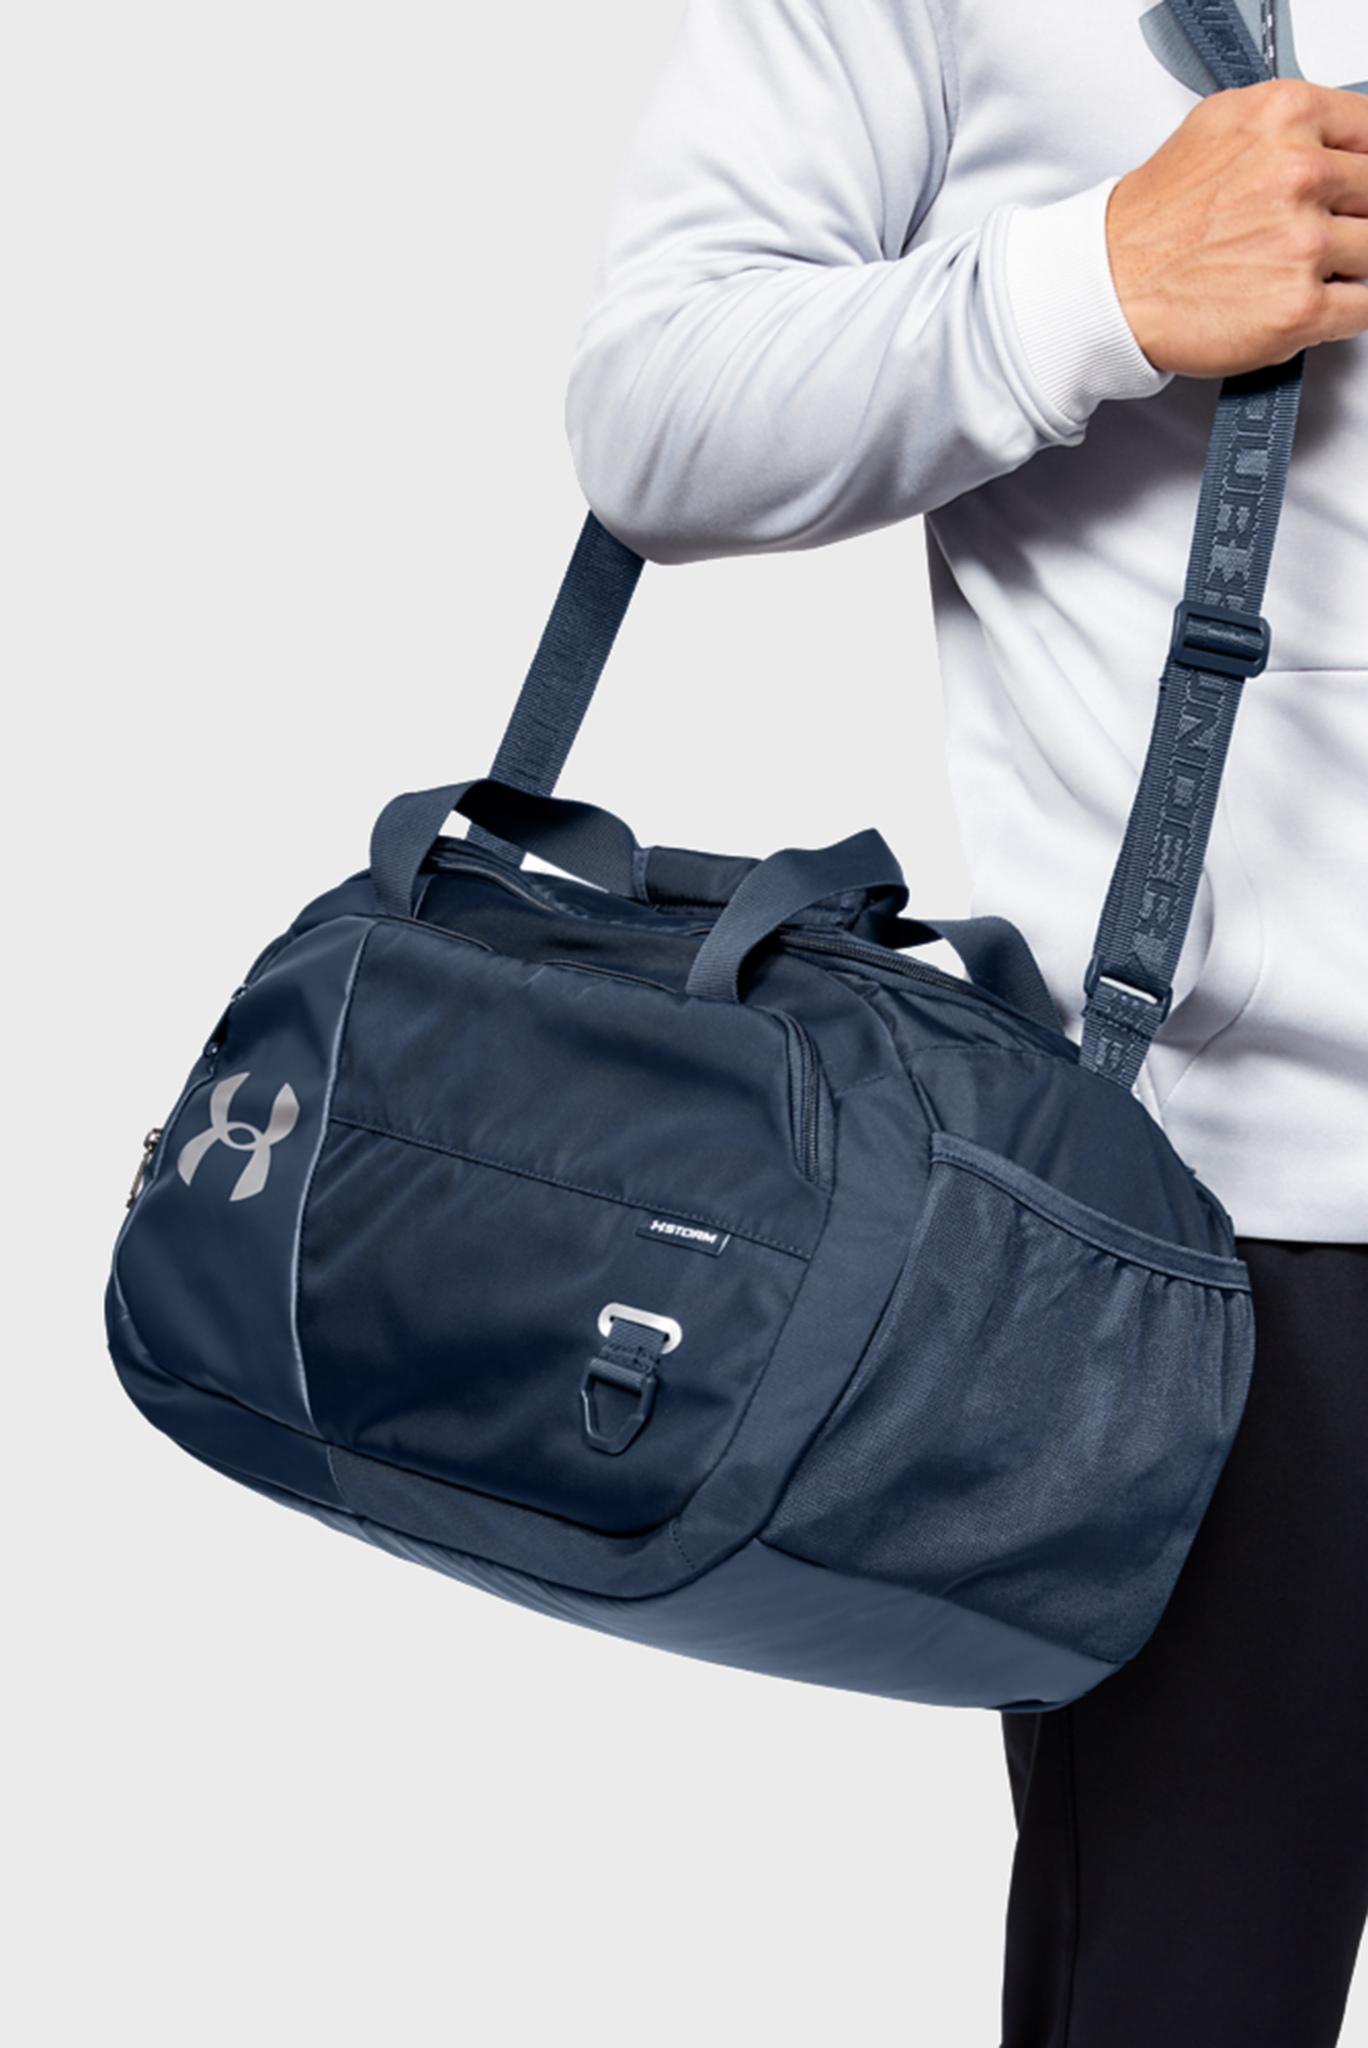 Синяя спортивная сумка Undeniable Duffel 4.0 XS Under Armour